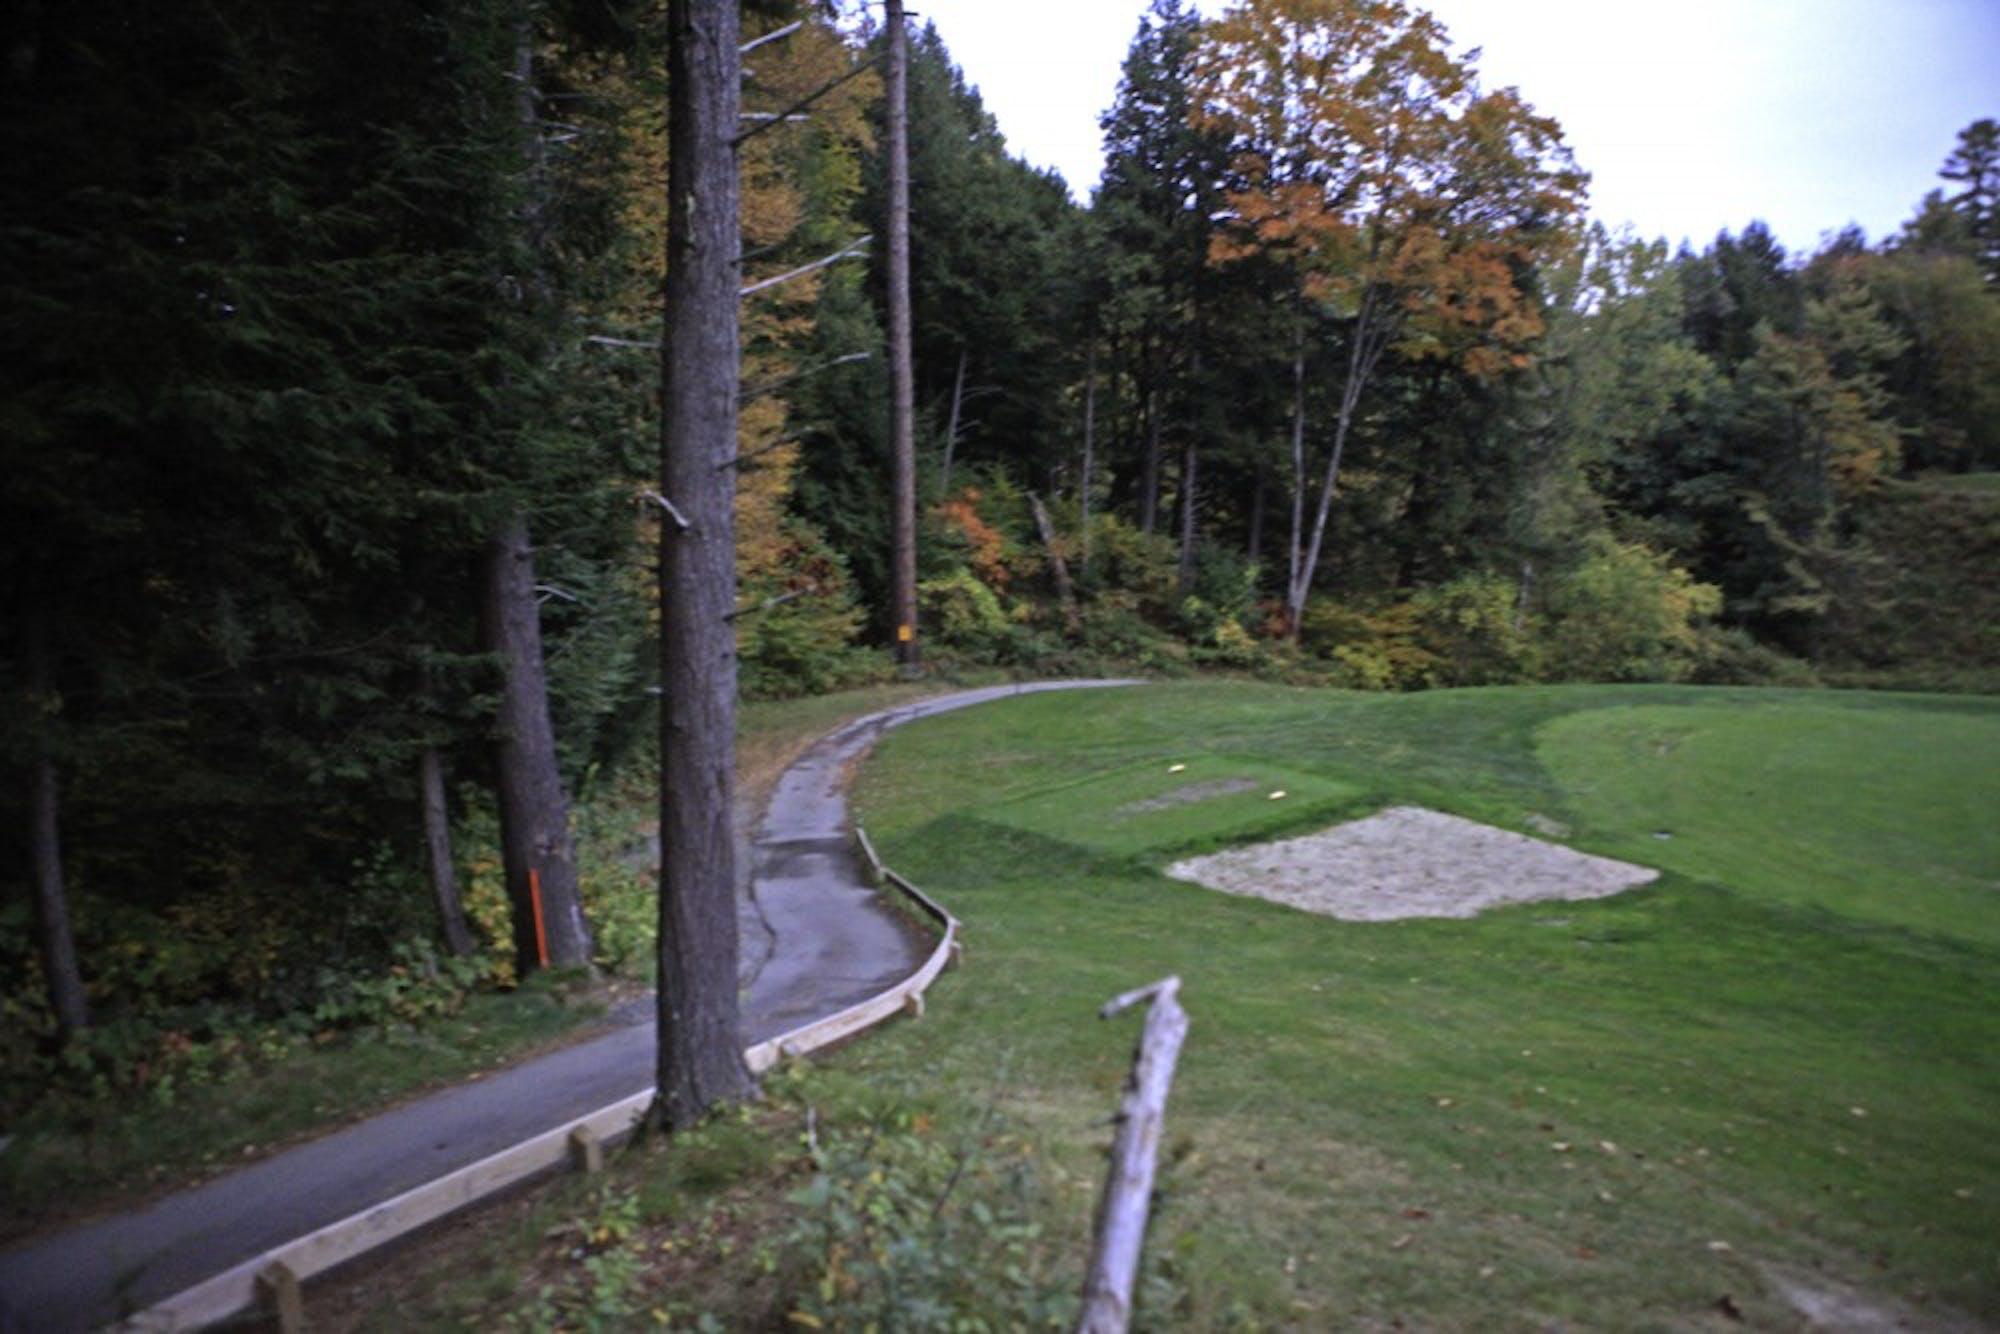 10-2-14-news-pinepark-jeffrey-lee